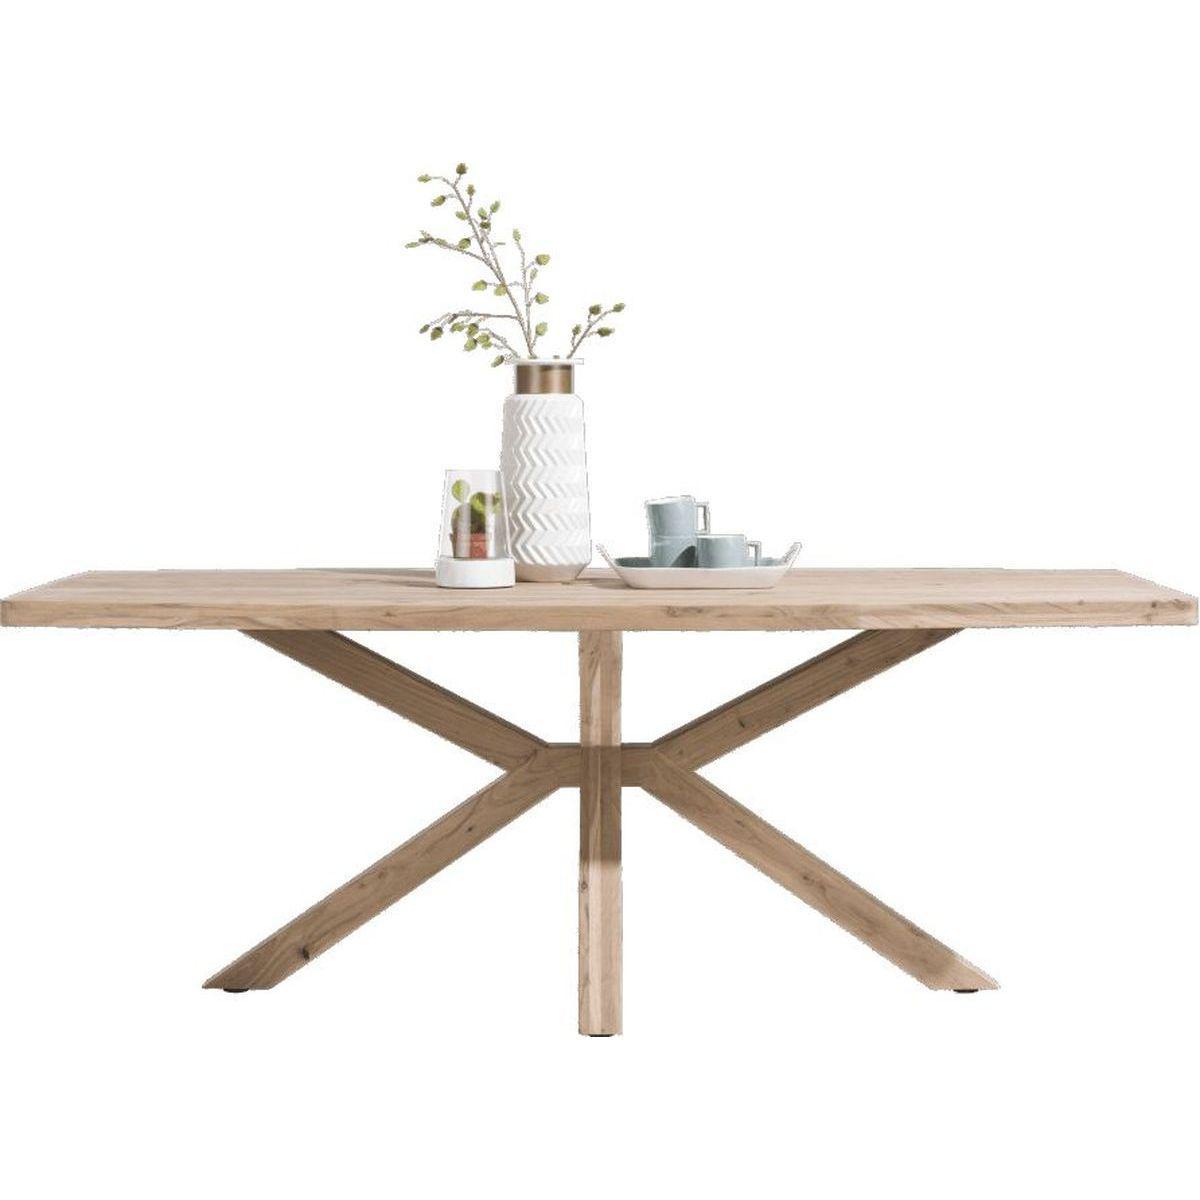 Table QUEBEC HetH 240x110cm pieds en bois